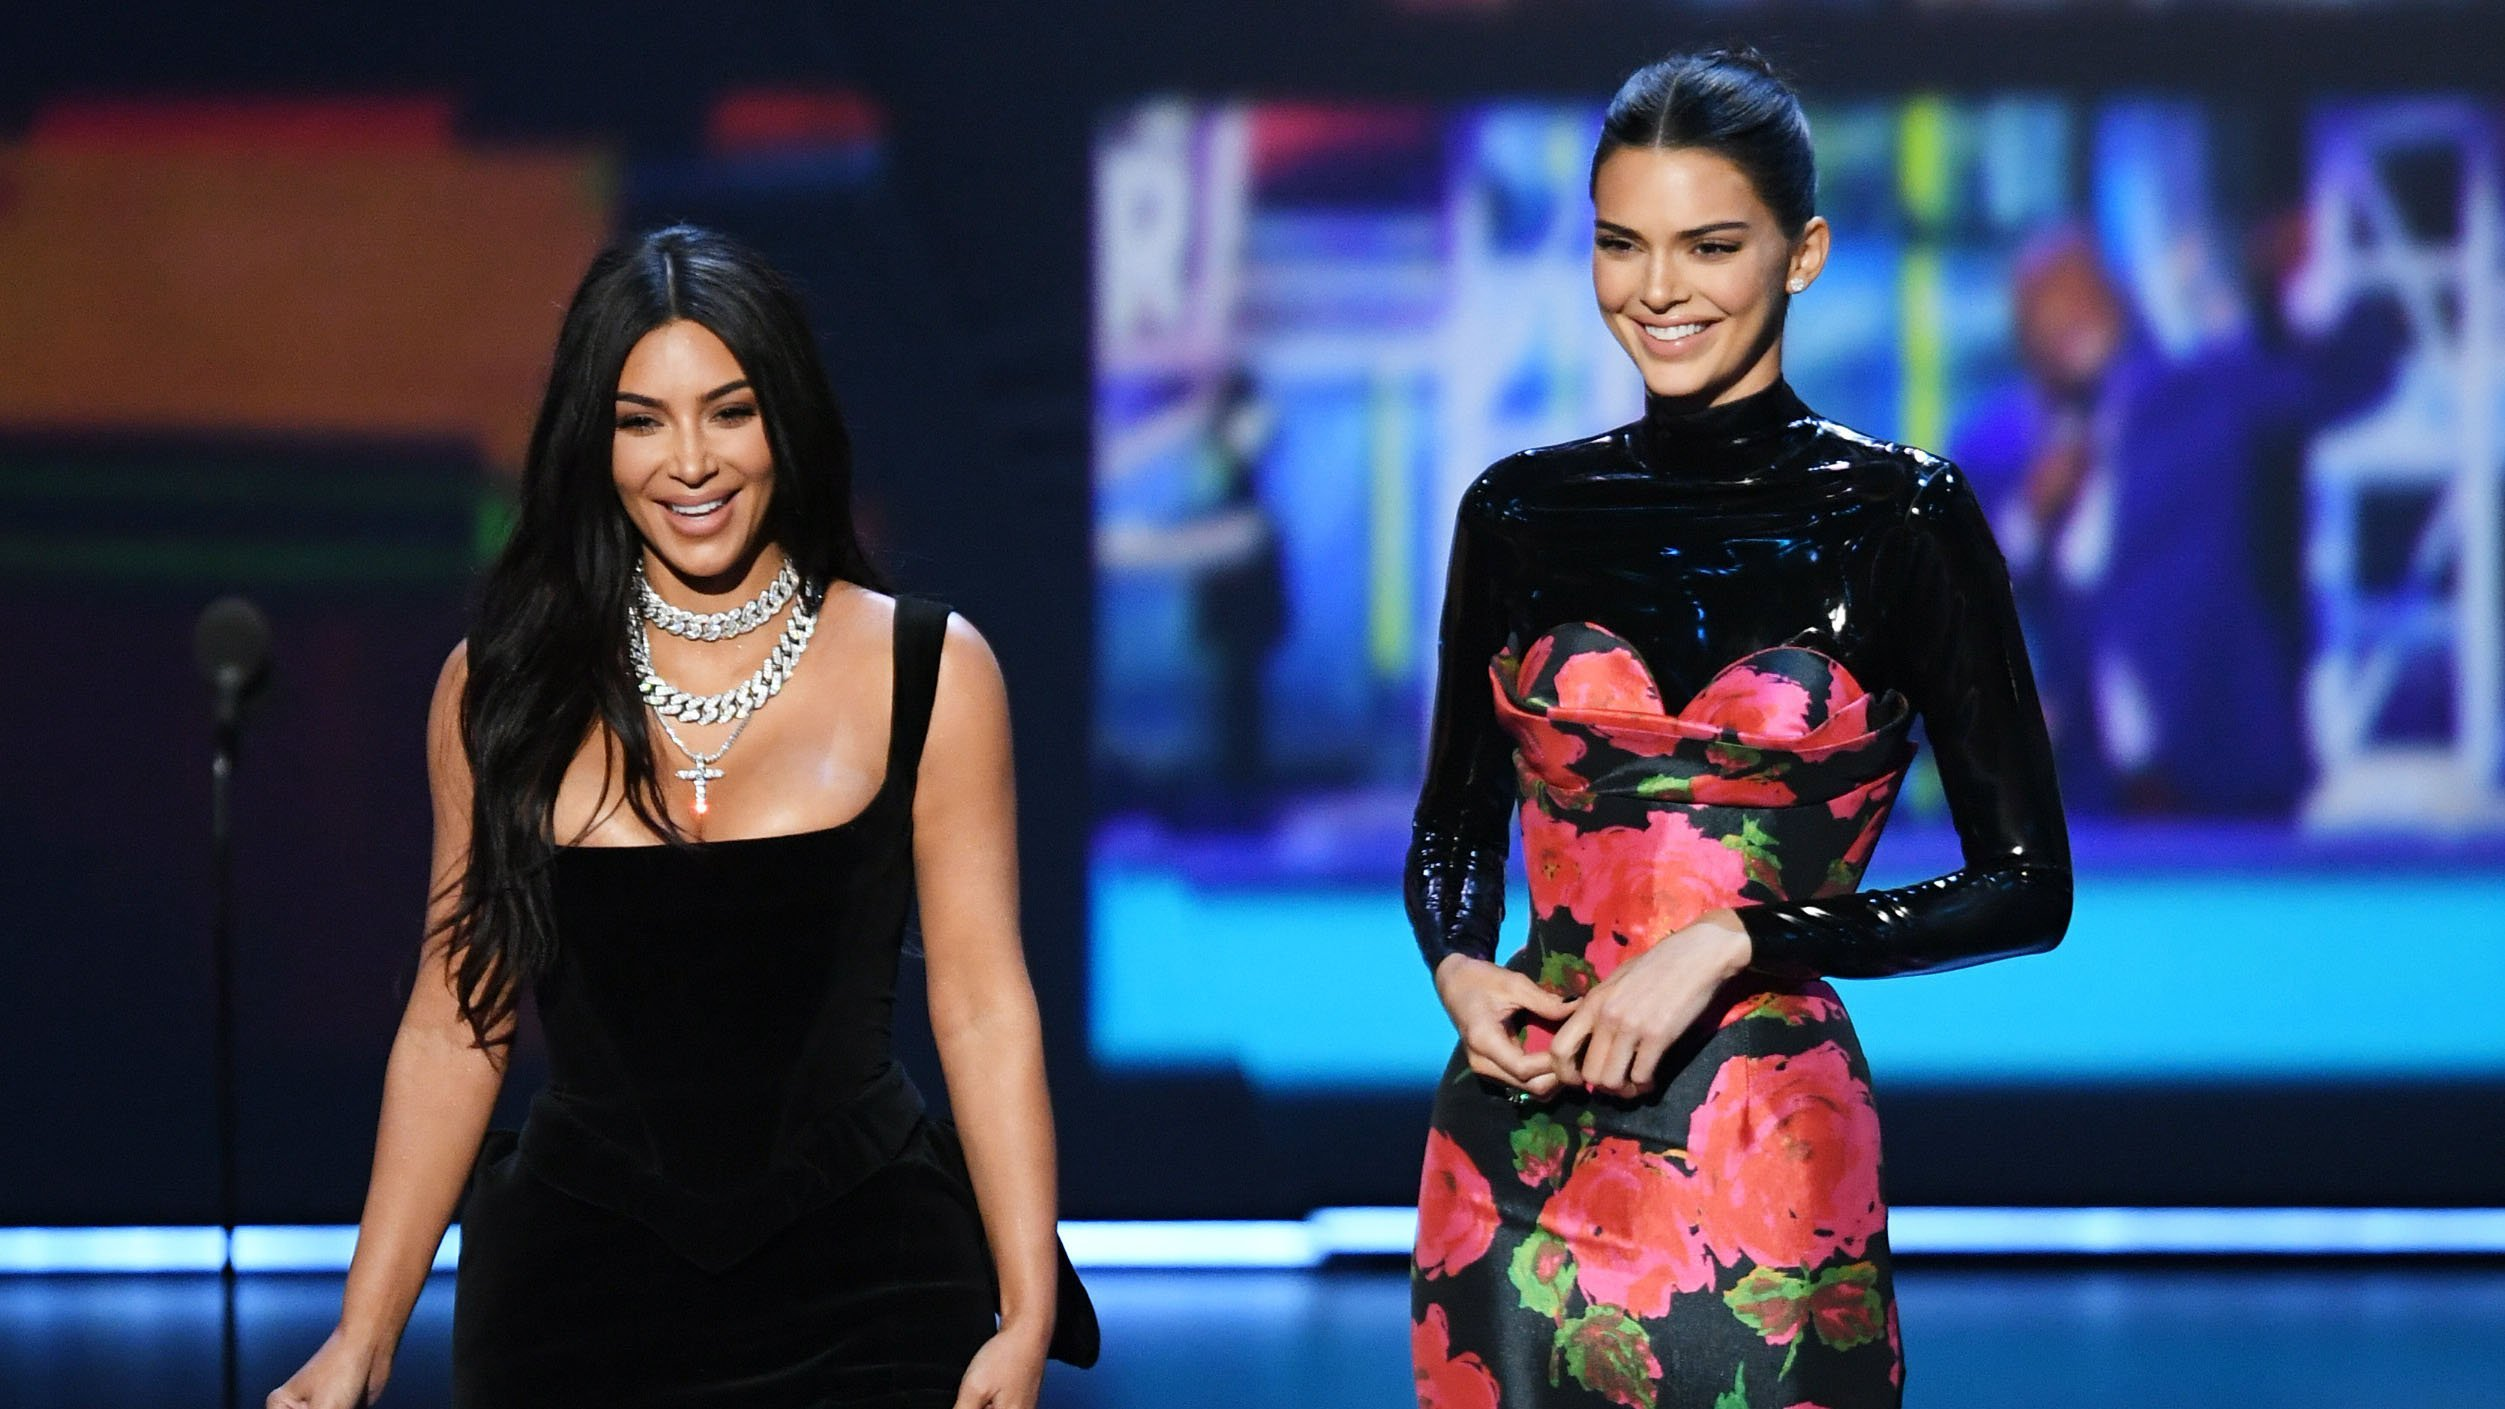 Kim Kardashian and Kendall Jenner mocked for Emmys speech